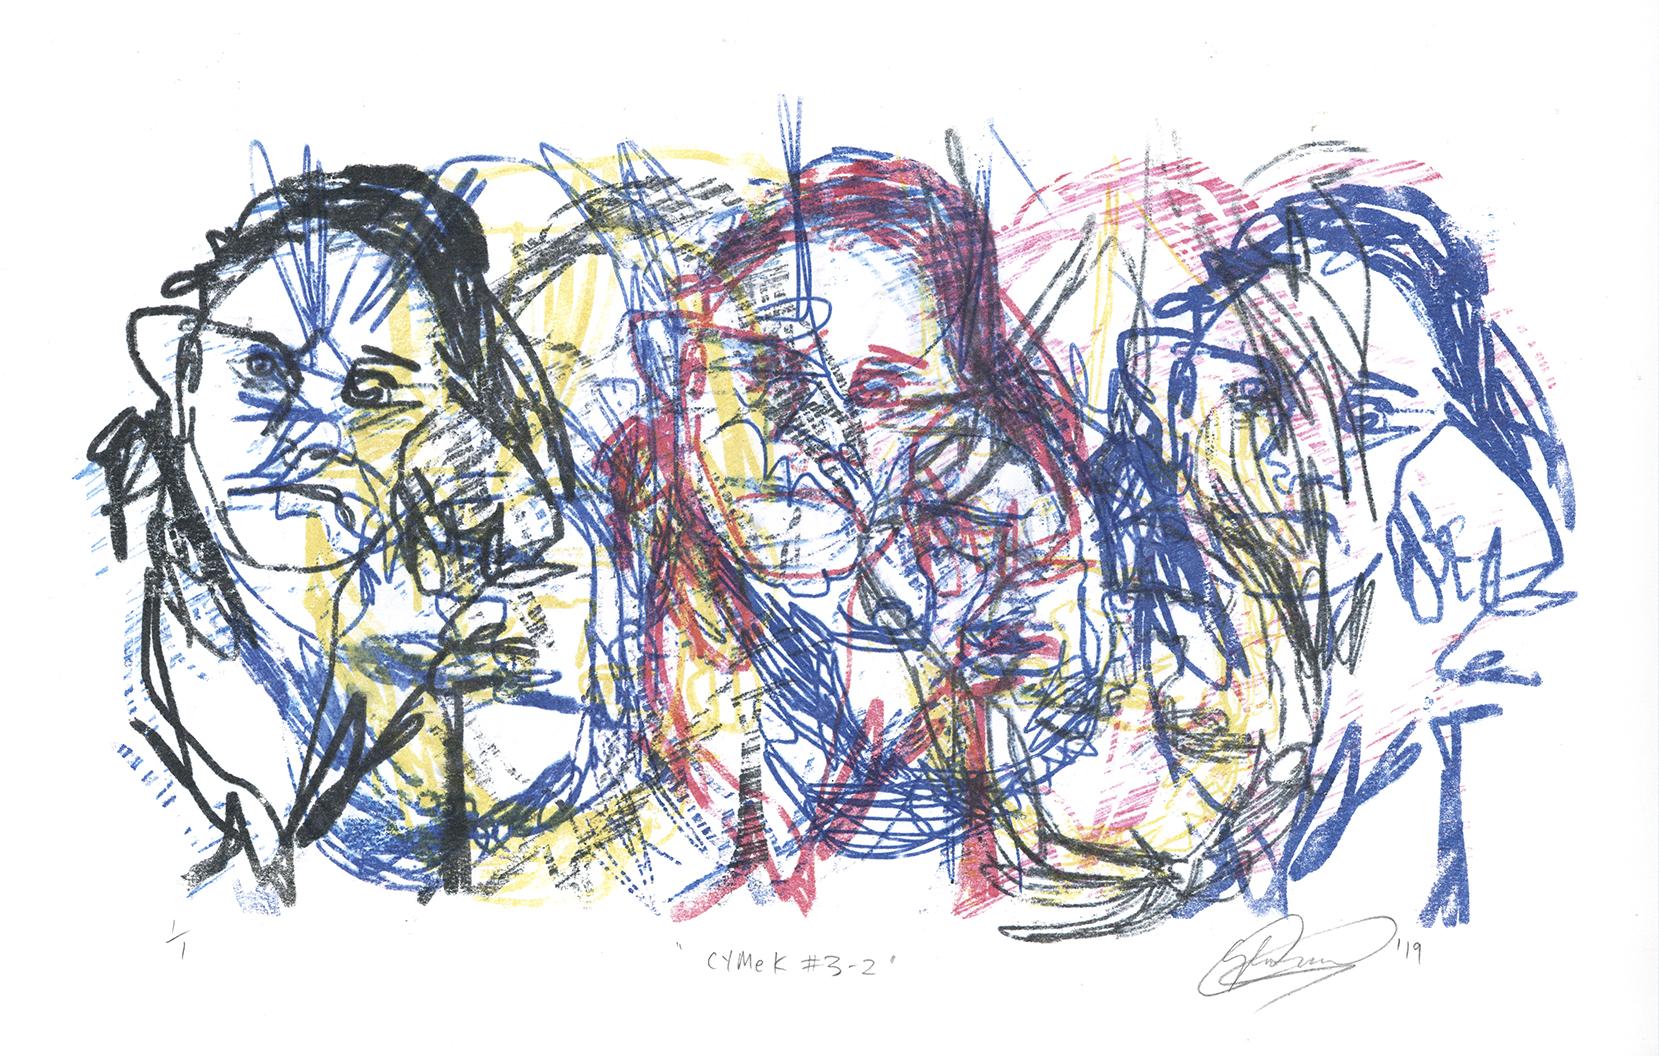 CYMeK # 3-2. Monoprint on Paper. 54cm x 39cm. 2019